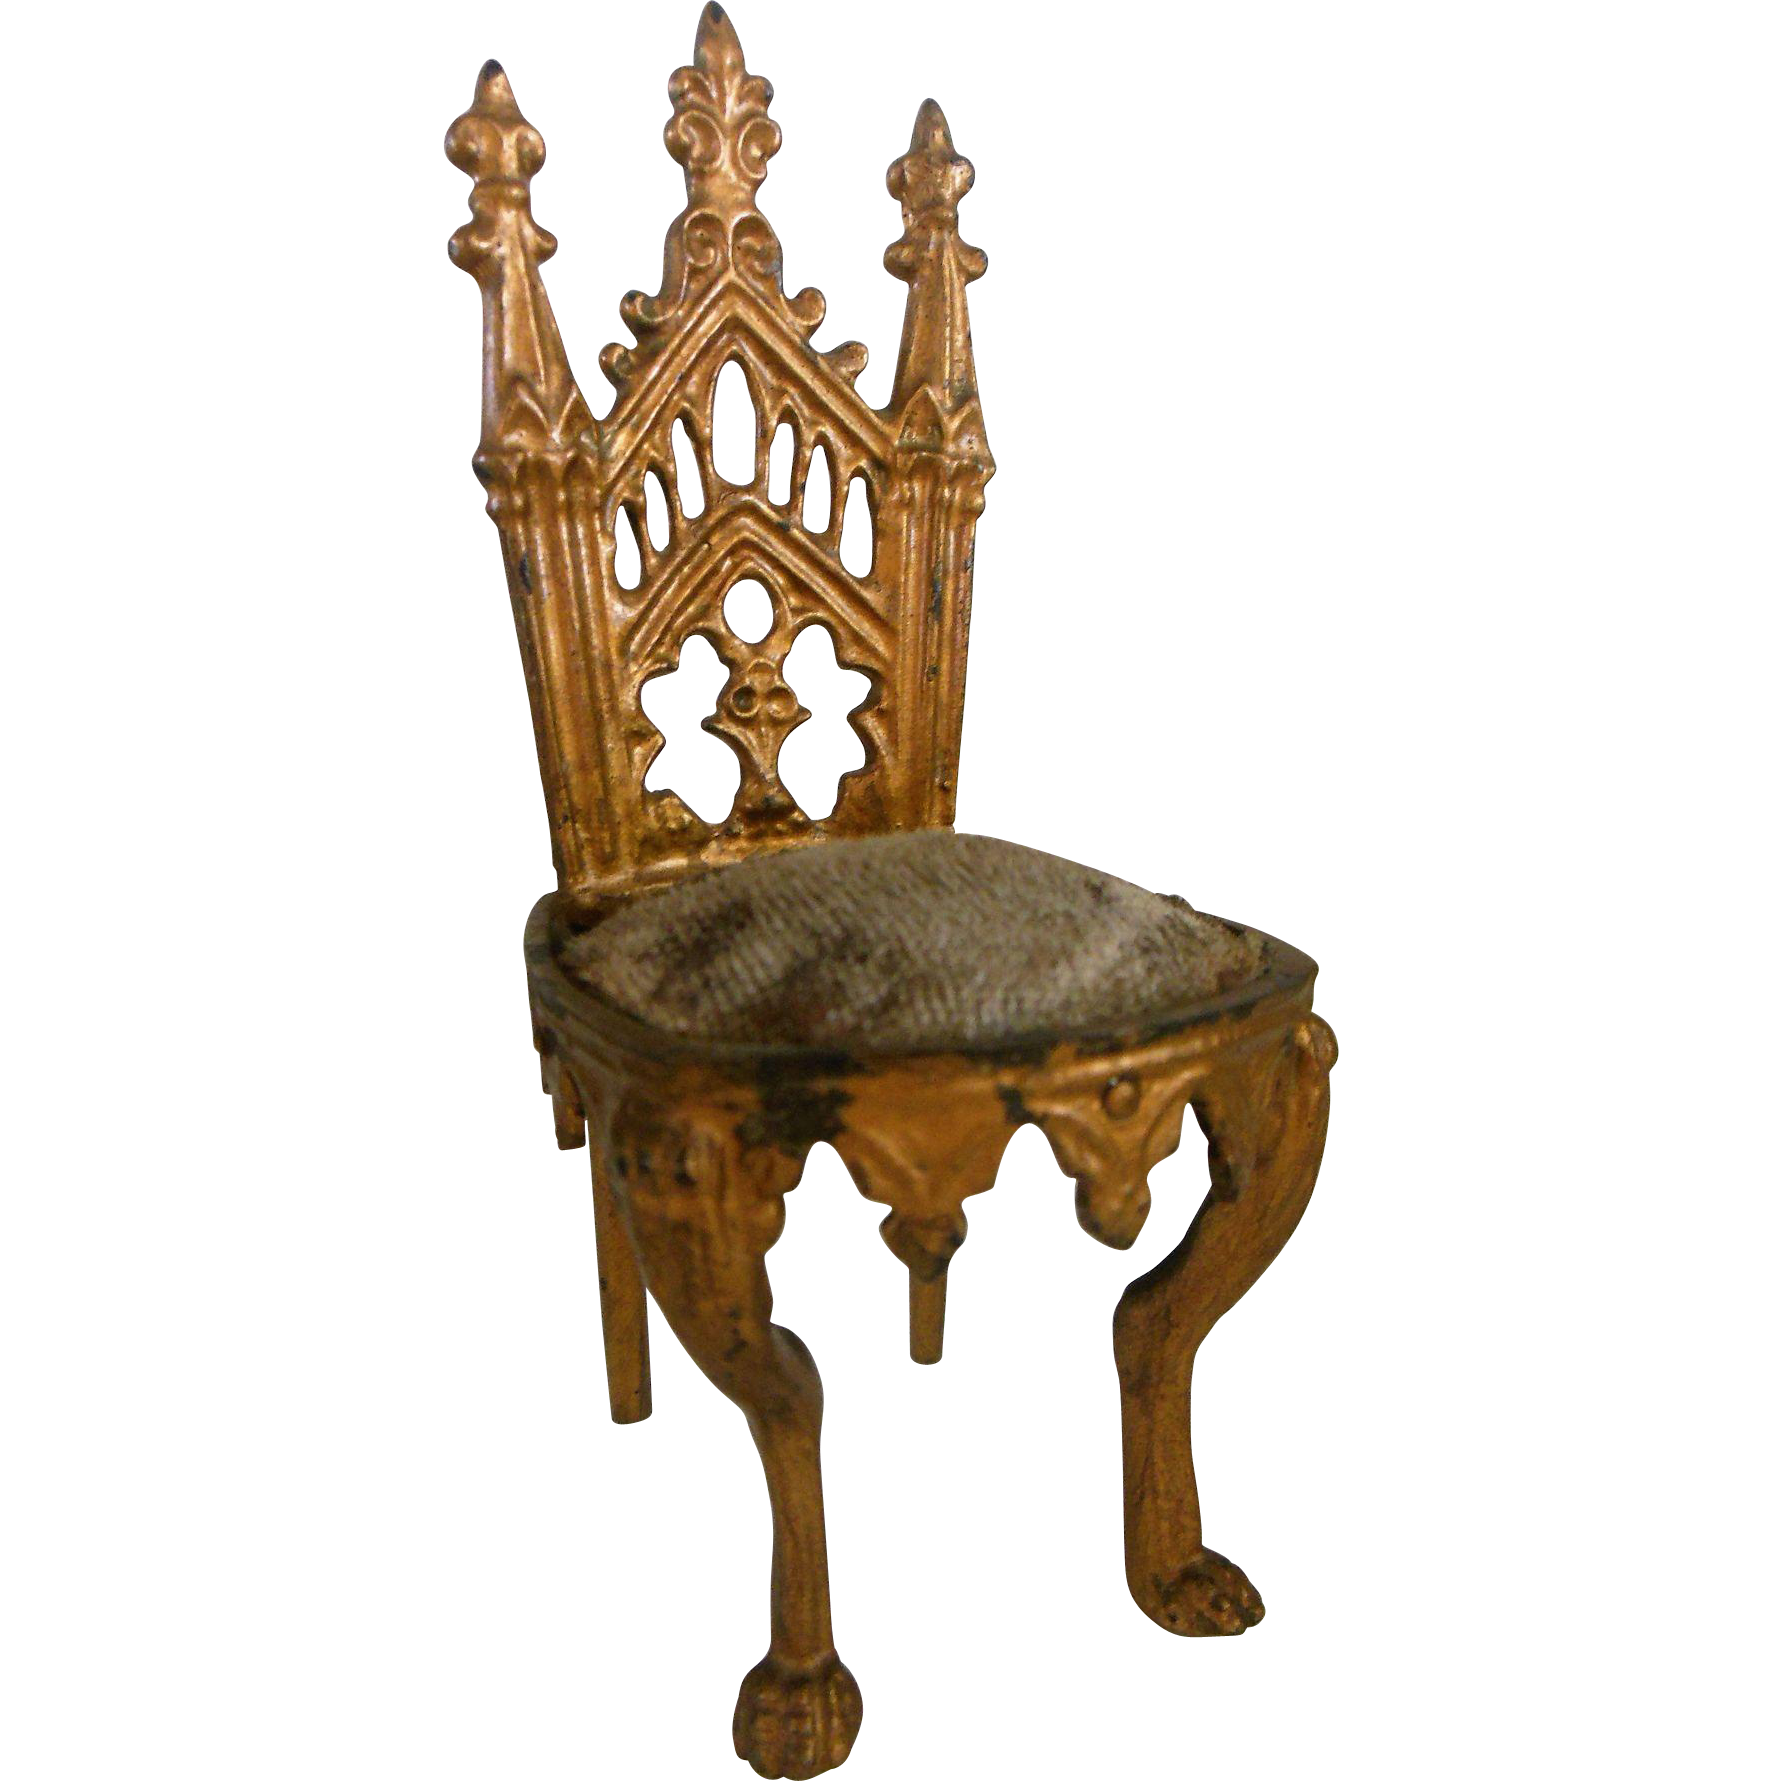 Wonderful Miniature gilded chair 1870-1880 era